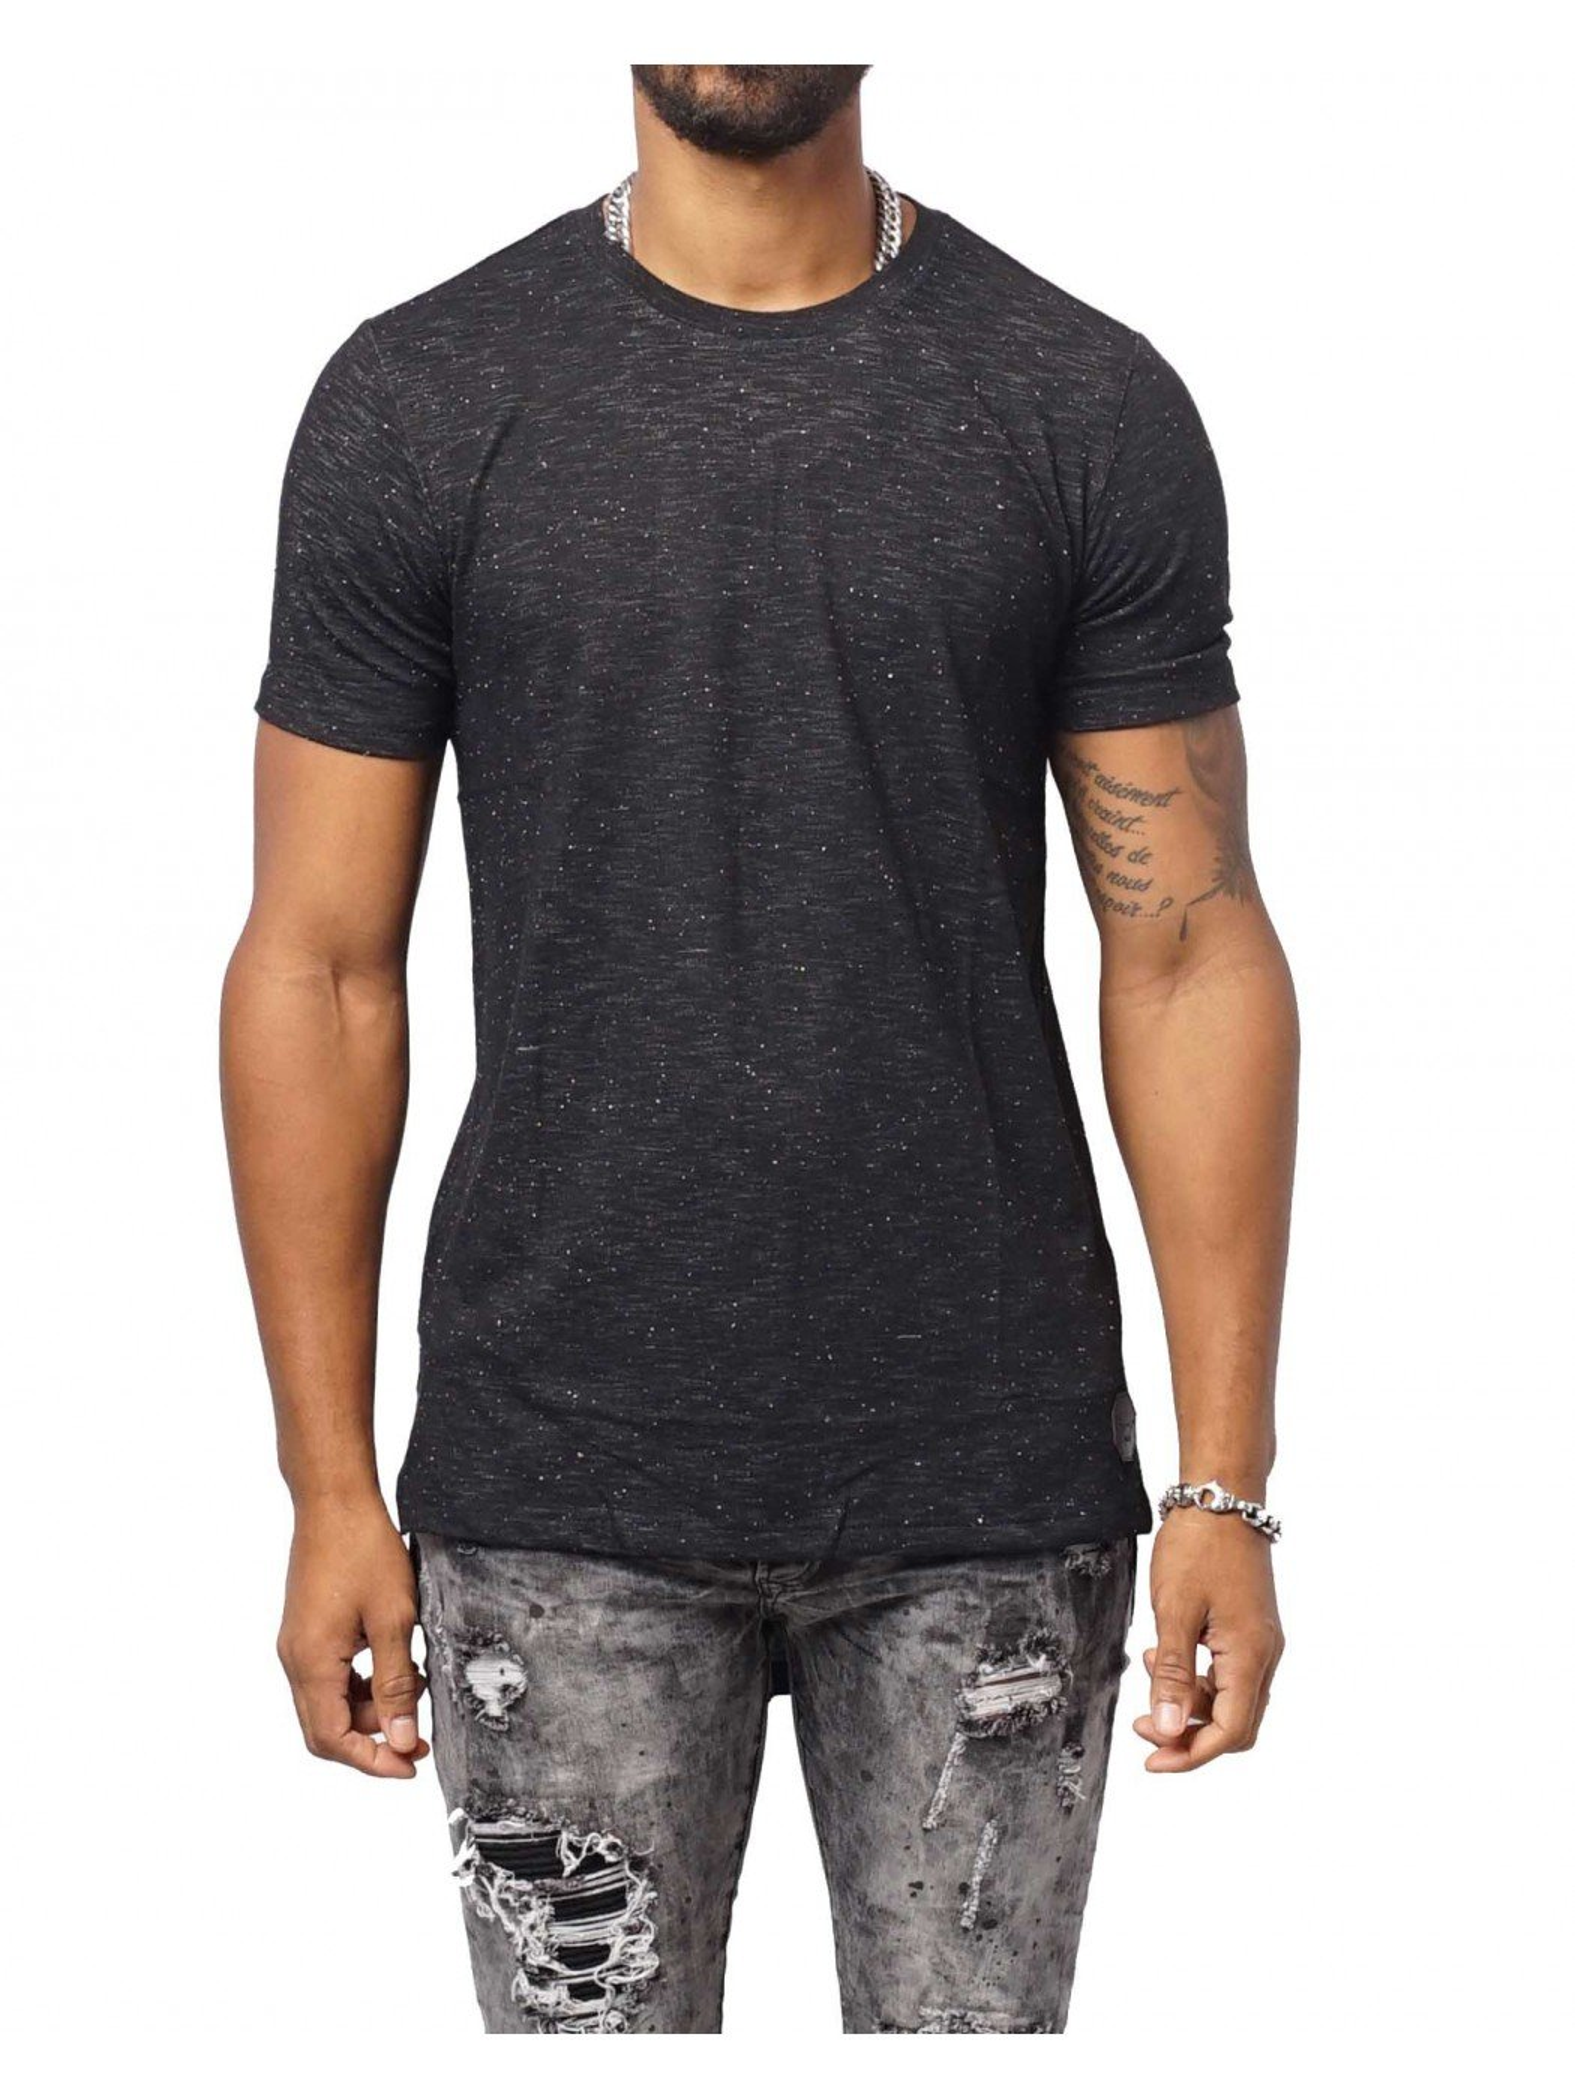 cotton blend oversized tee shirt project x paris 88161122. Black Bedroom Furniture Sets. Home Design Ideas